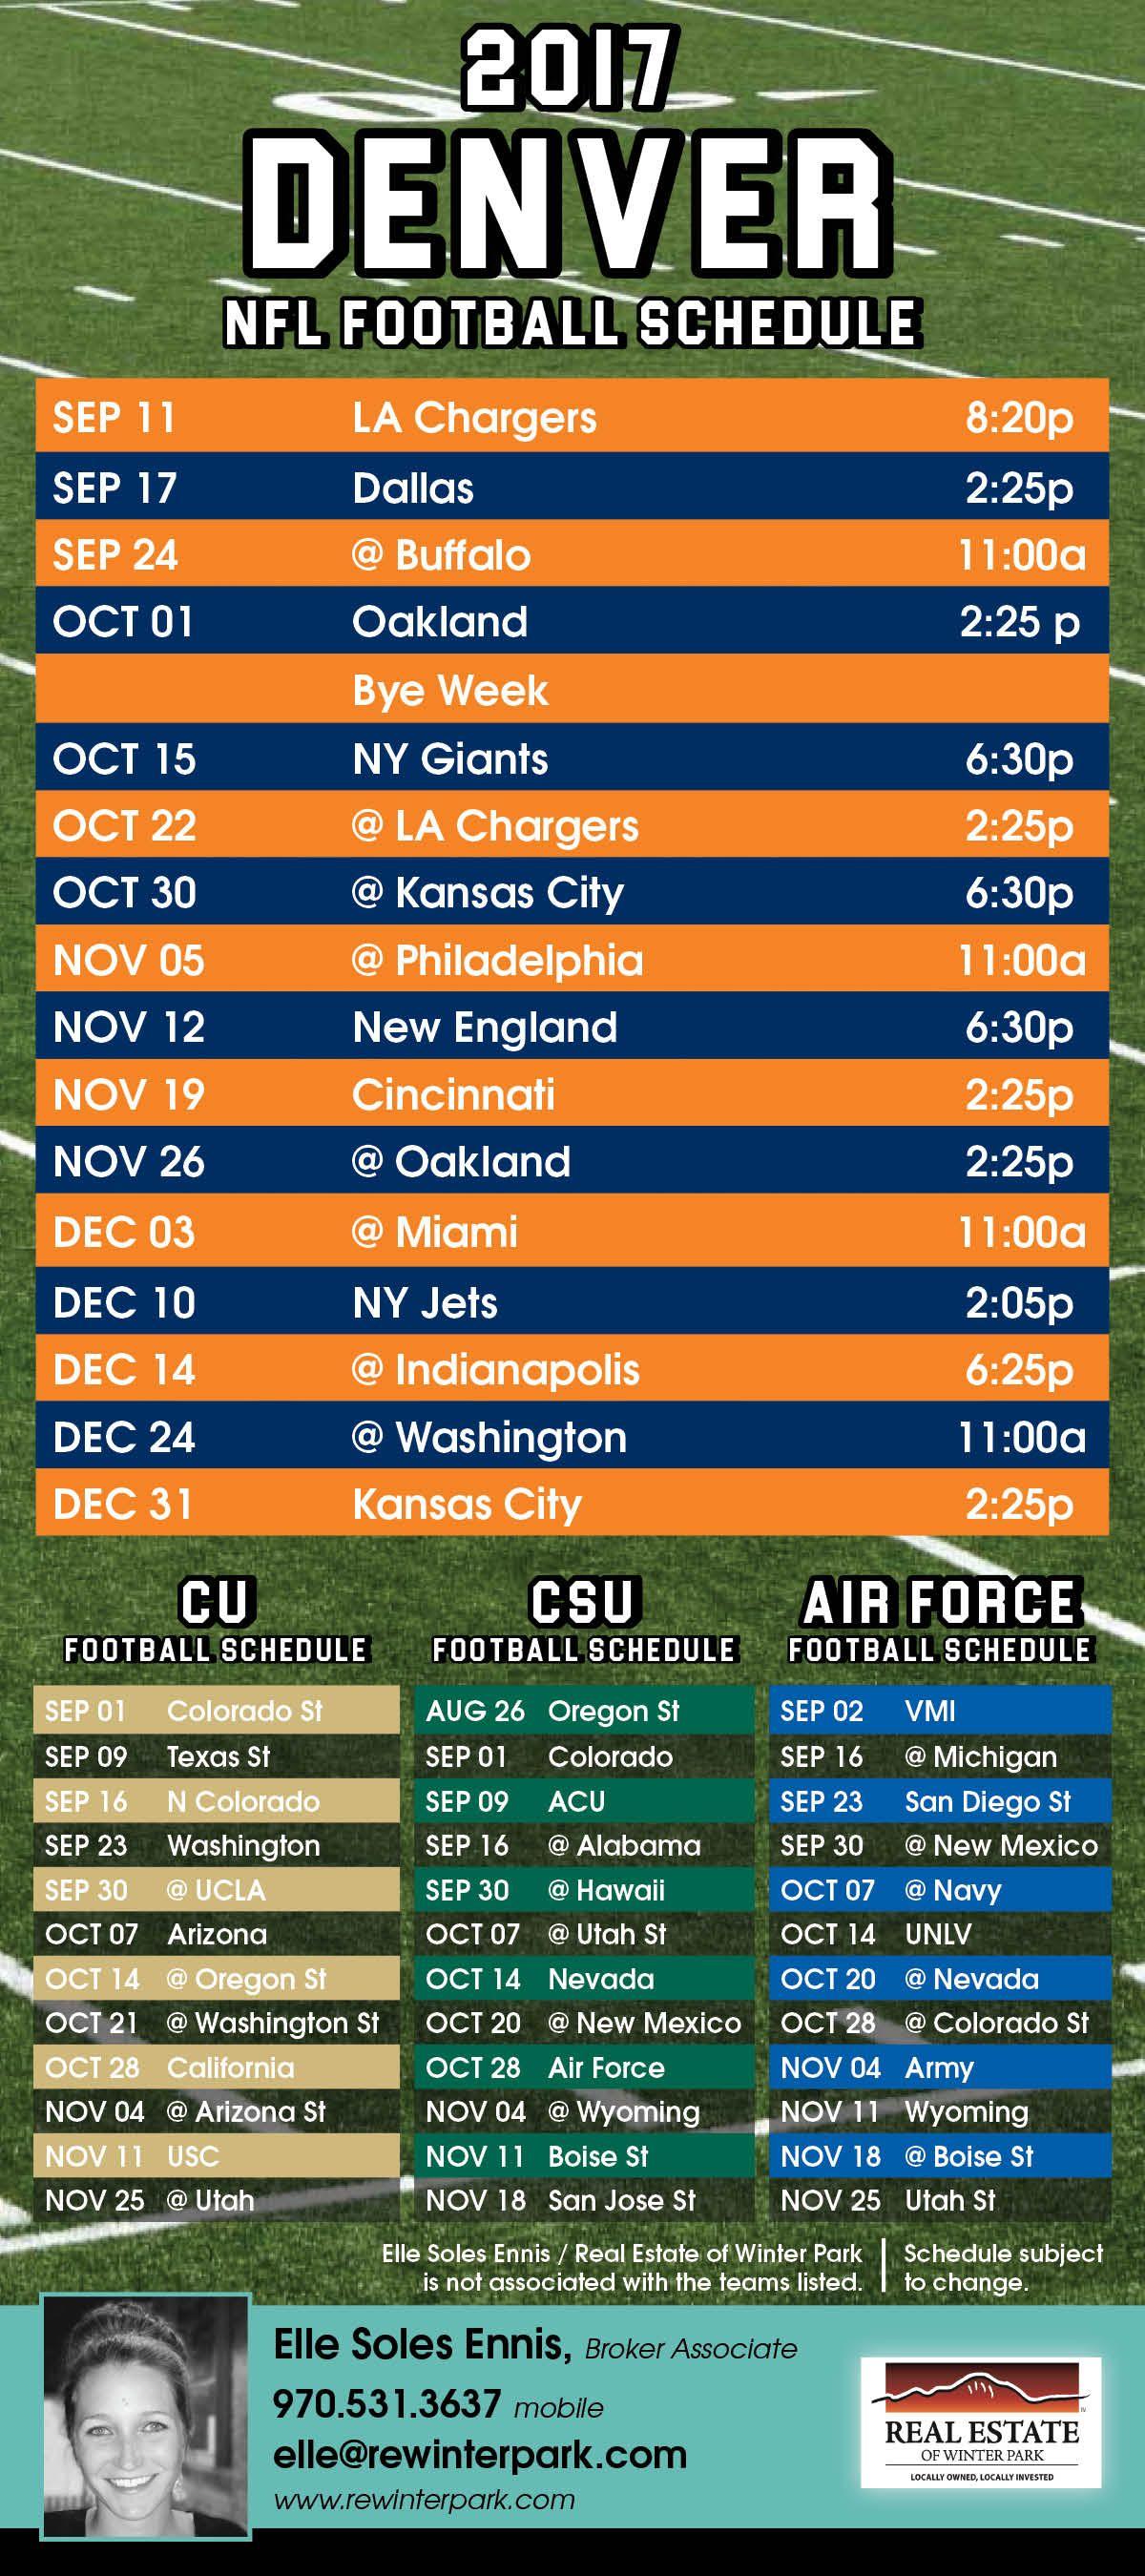 Broncos Schedule Air Force Football Schedule Colorado